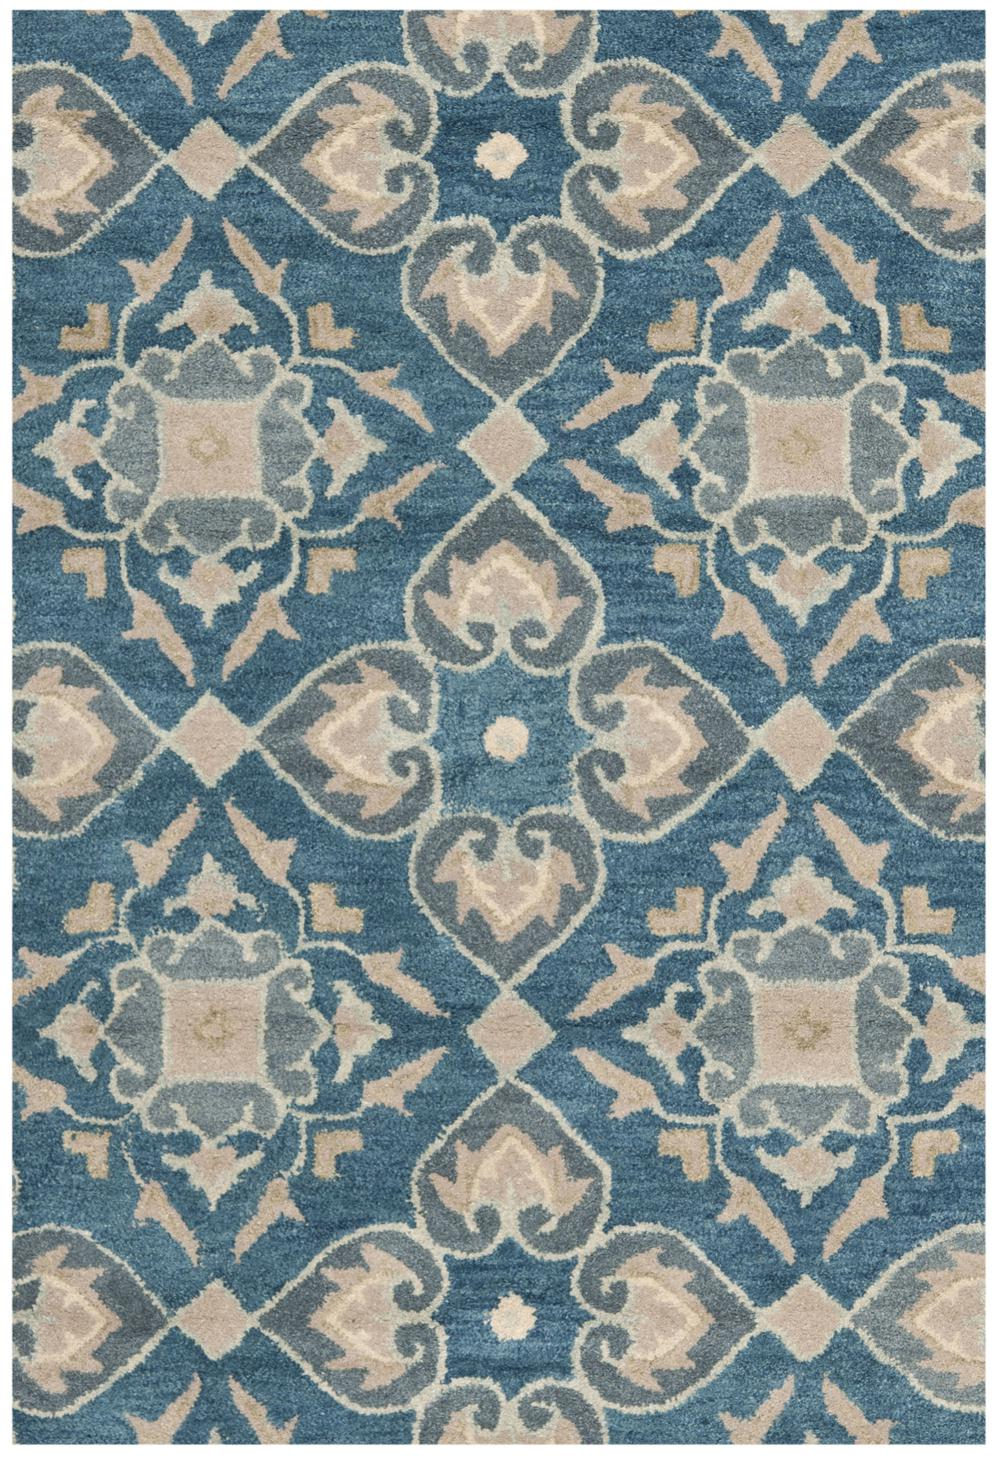 safavieh wyndham wyd614a blue and grey area rug free shipping. Black Bedroom Furniture Sets. Home Design Ideas